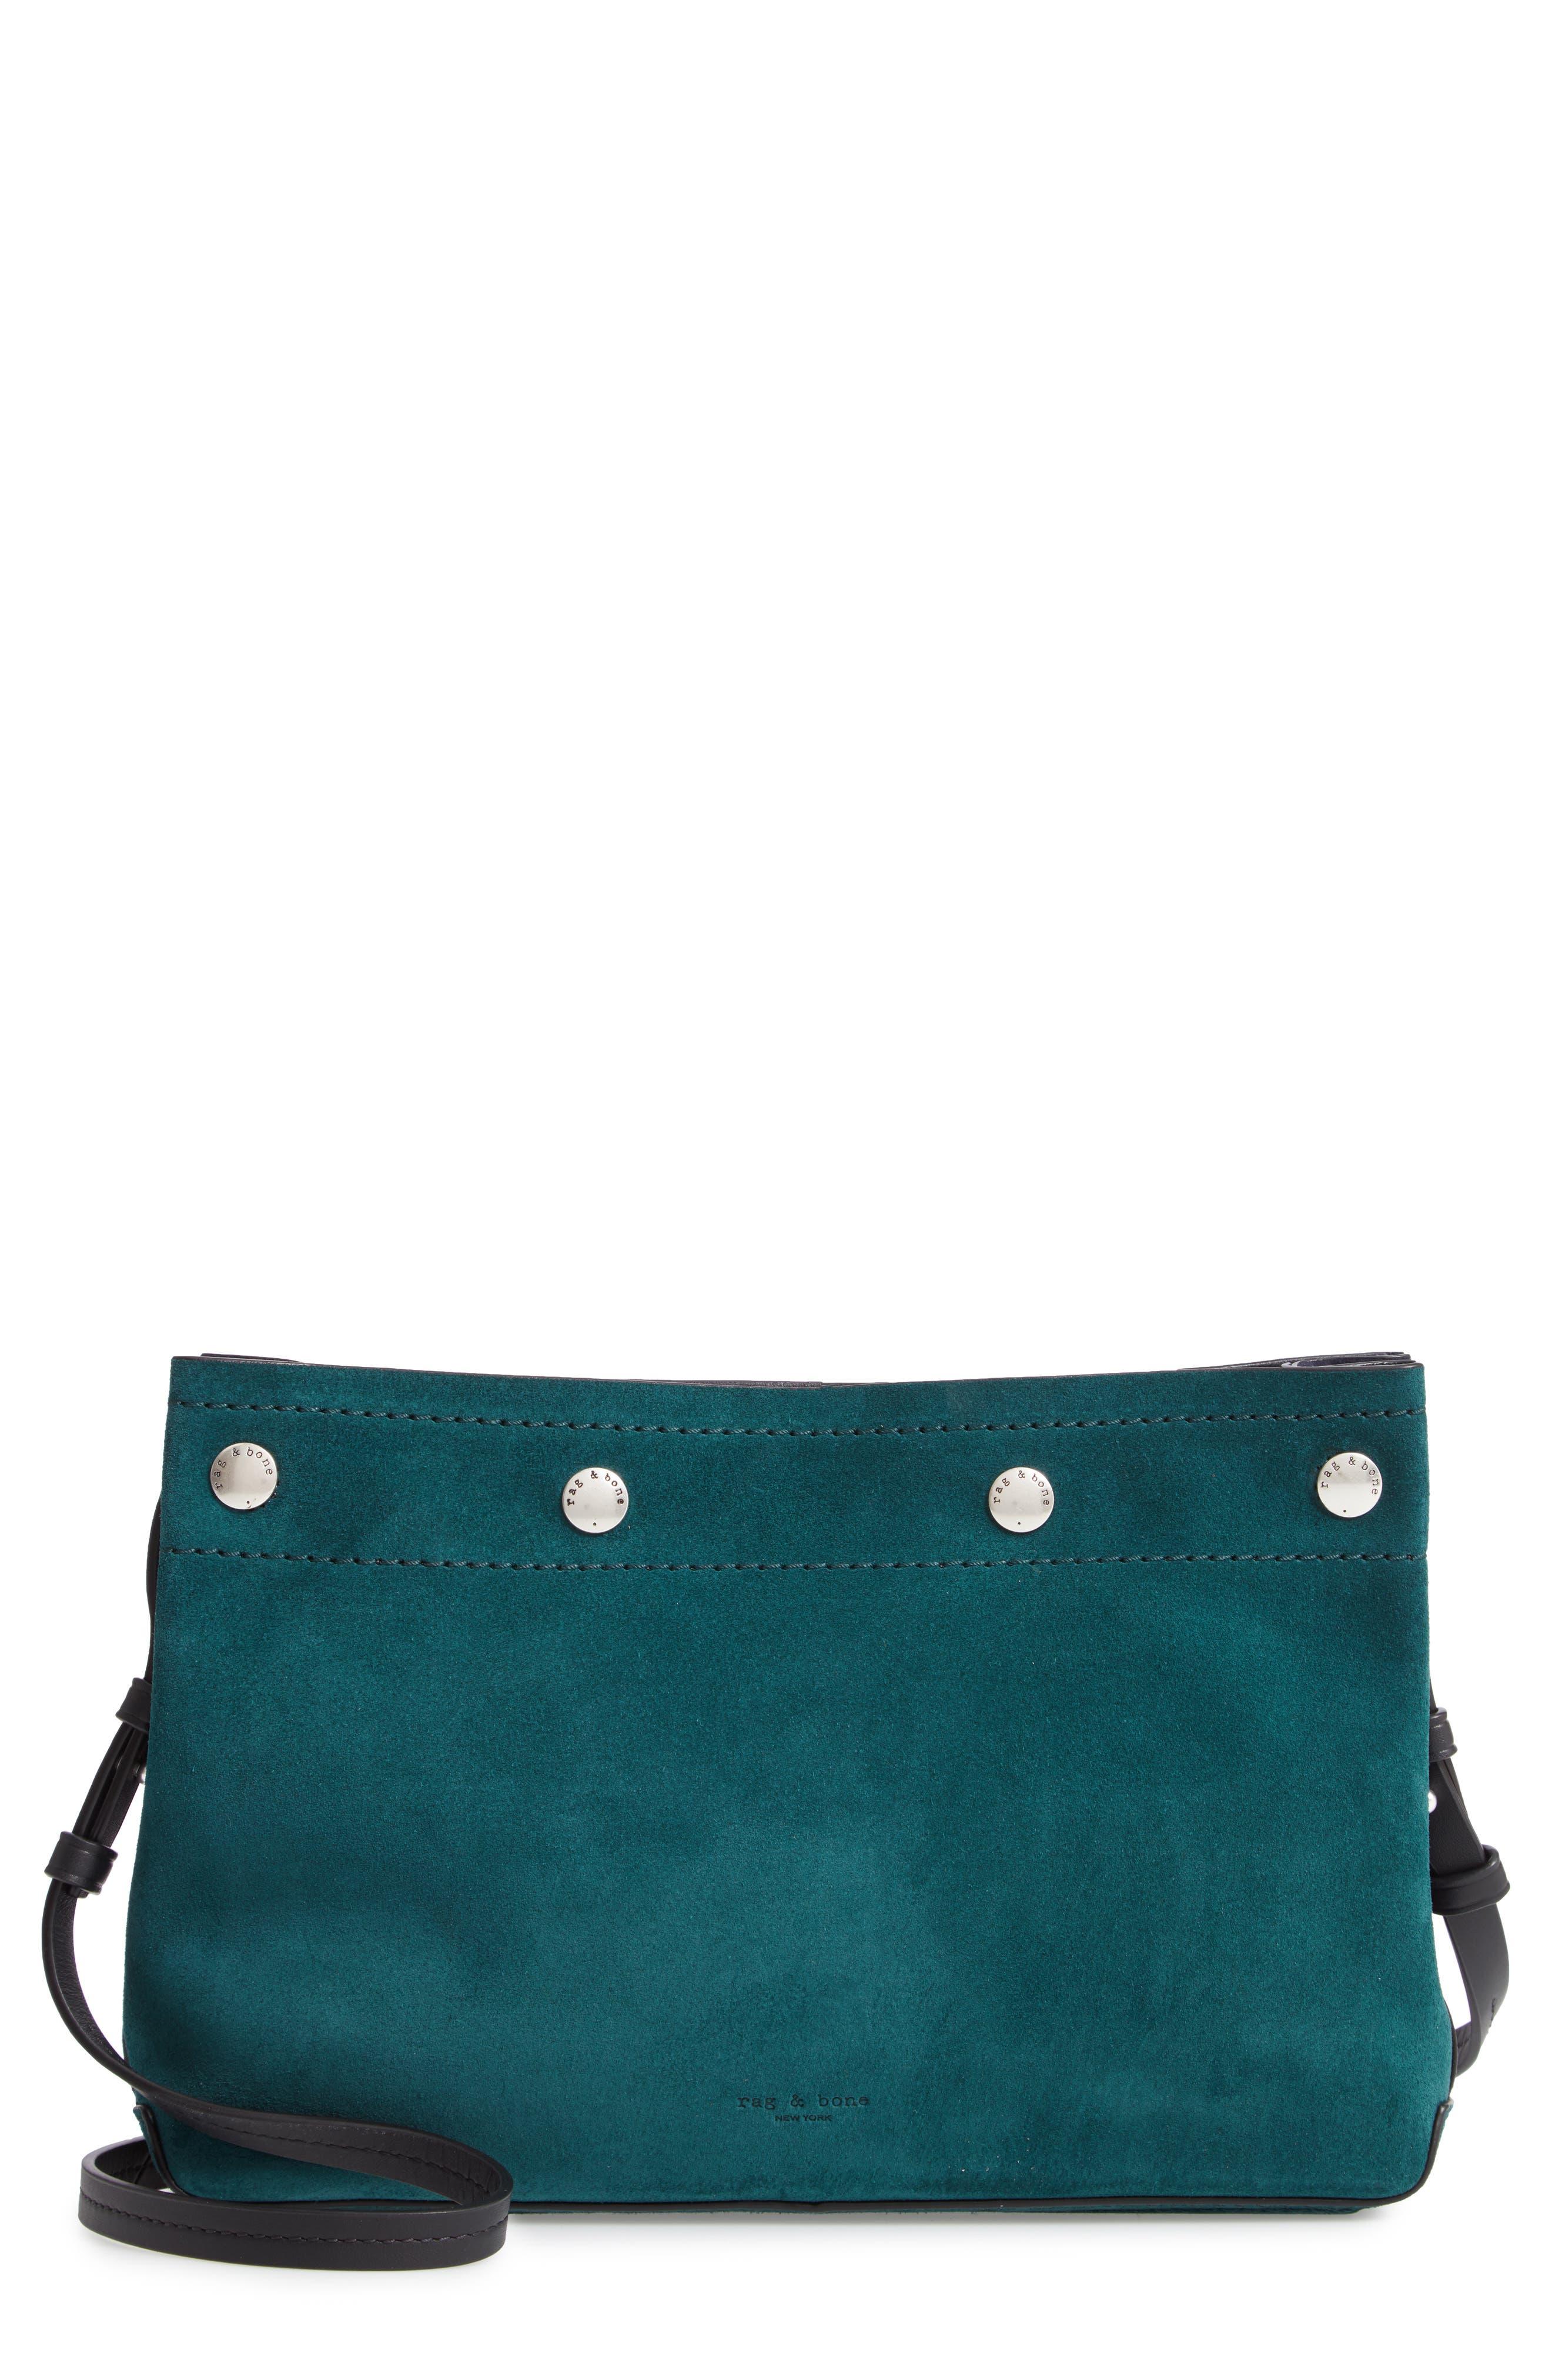 RAG & BONE Compass Colorblock Leather Crossbody Bag, Main, color, FOREST MULTI